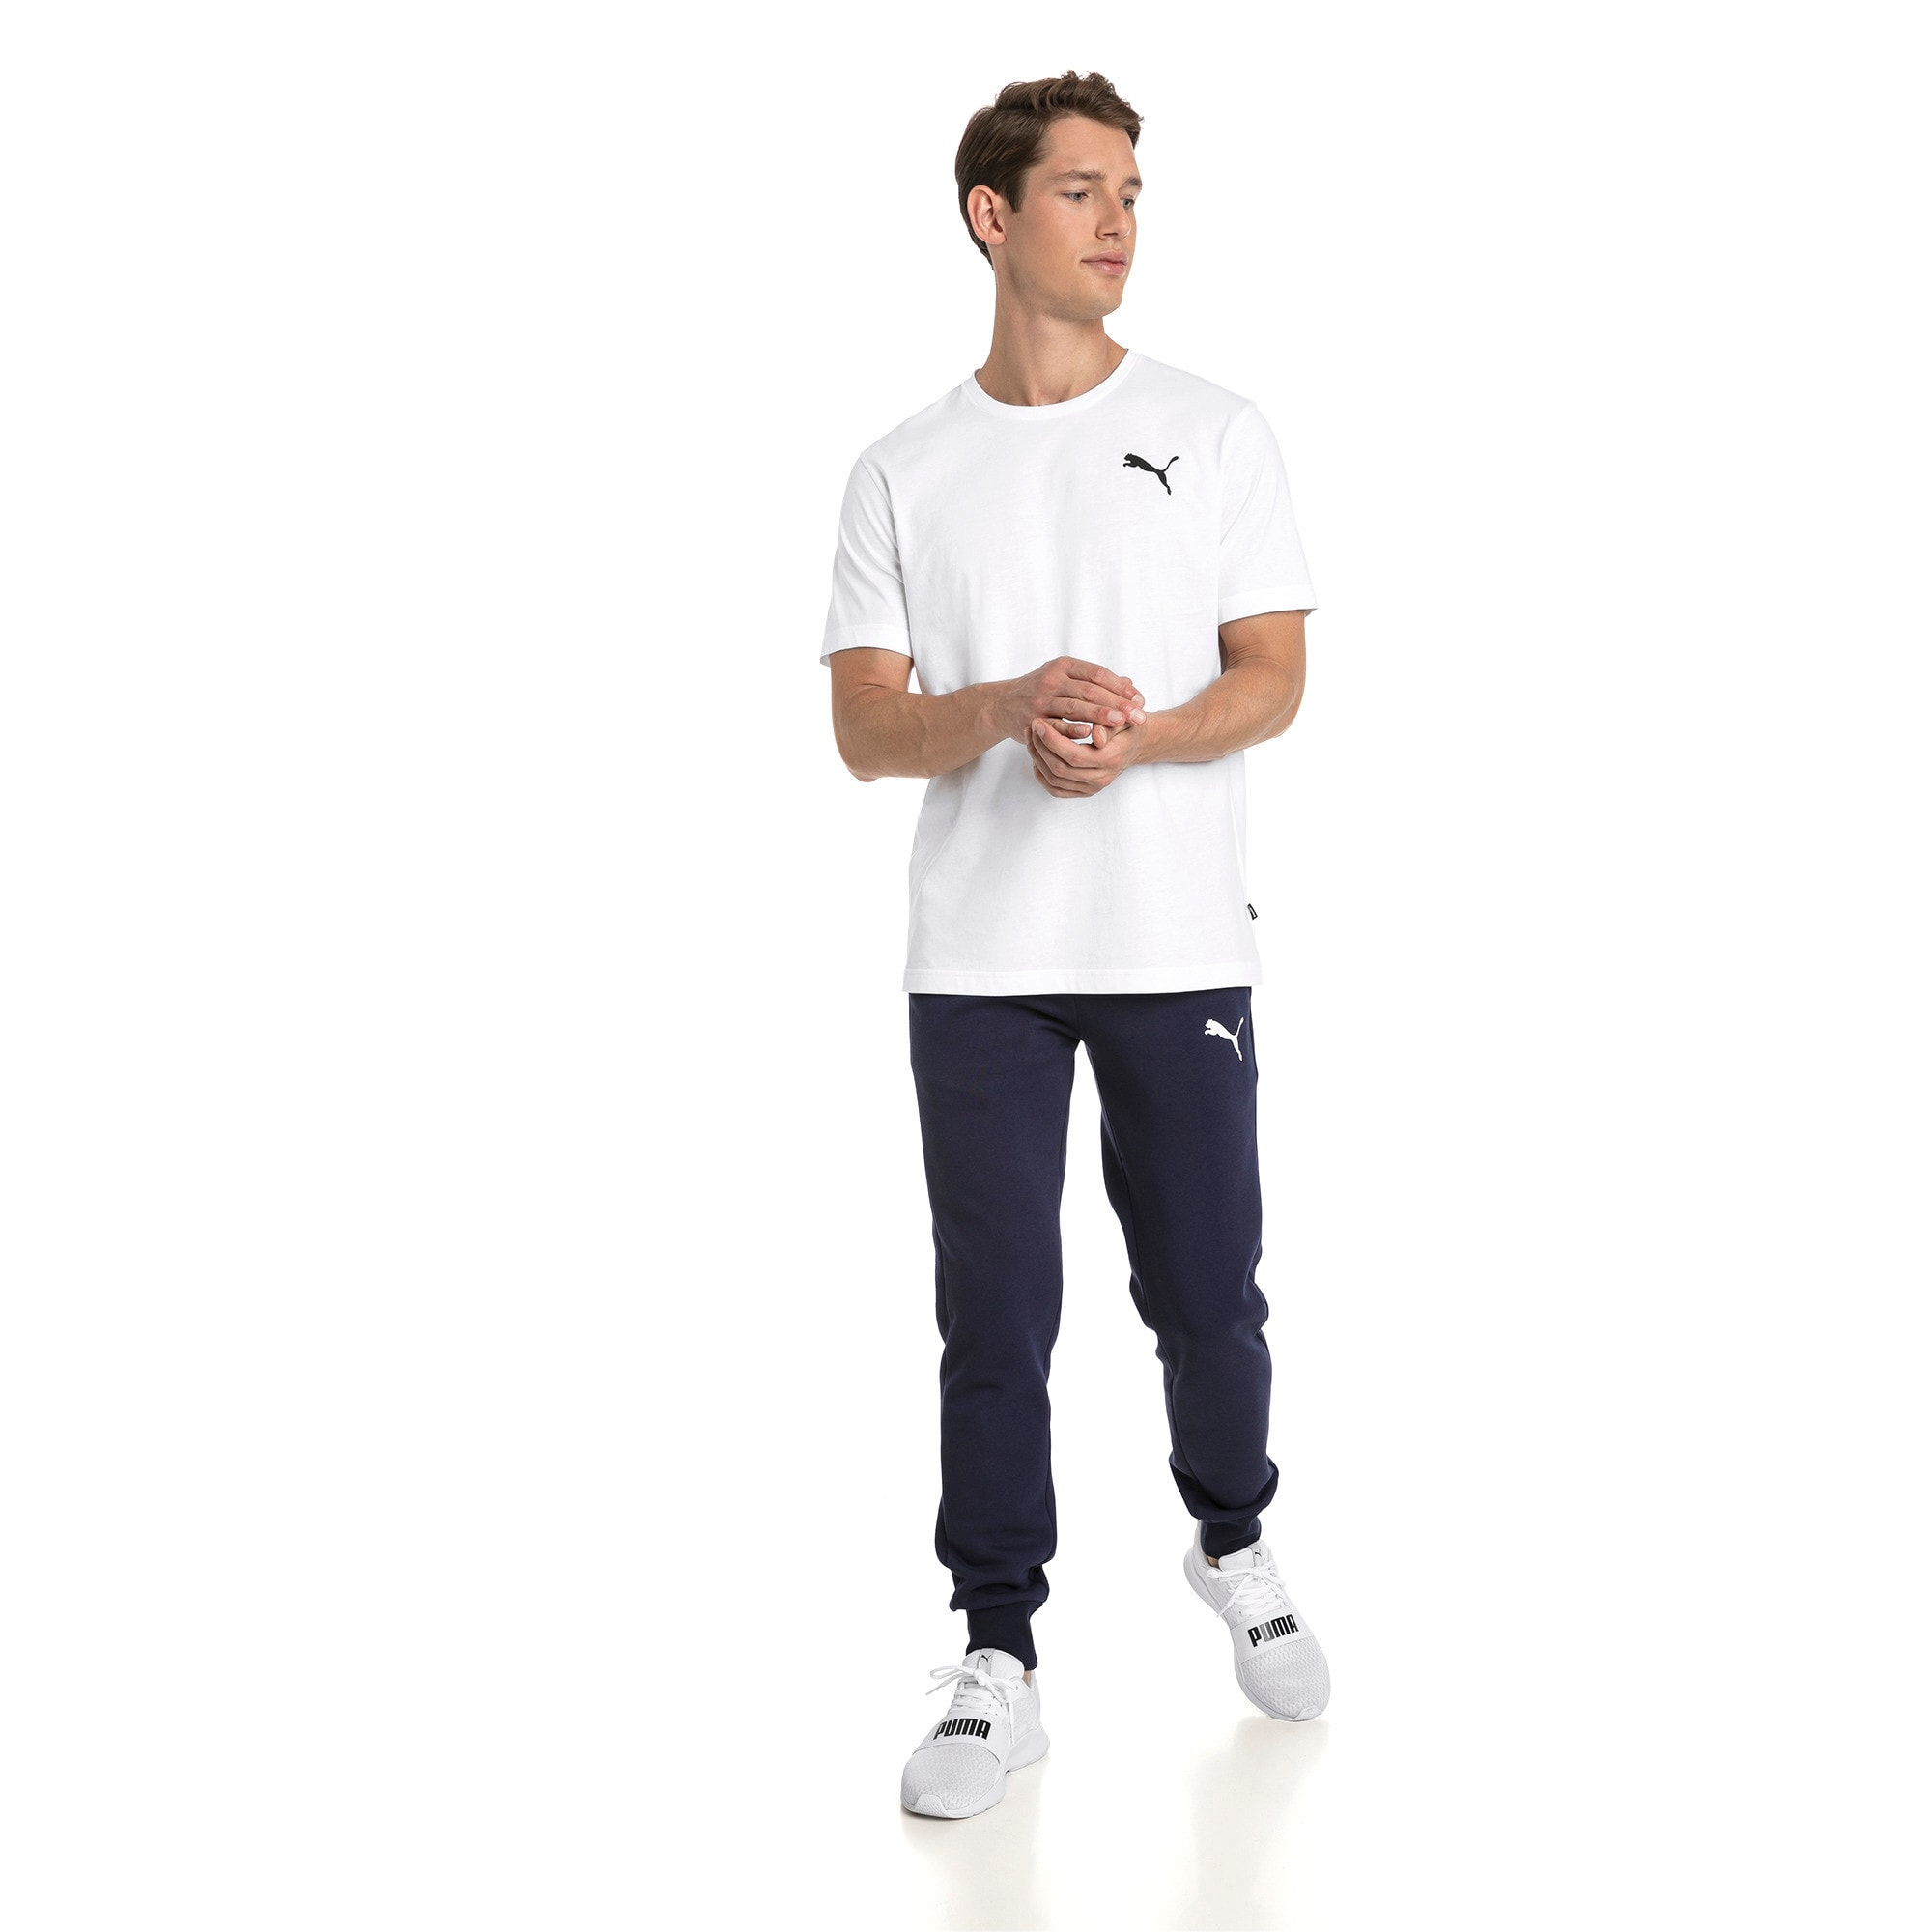 Thumbnail 3 of T-shirt con logo piccolo Essentials uomo, Puma White-_Cat, medium